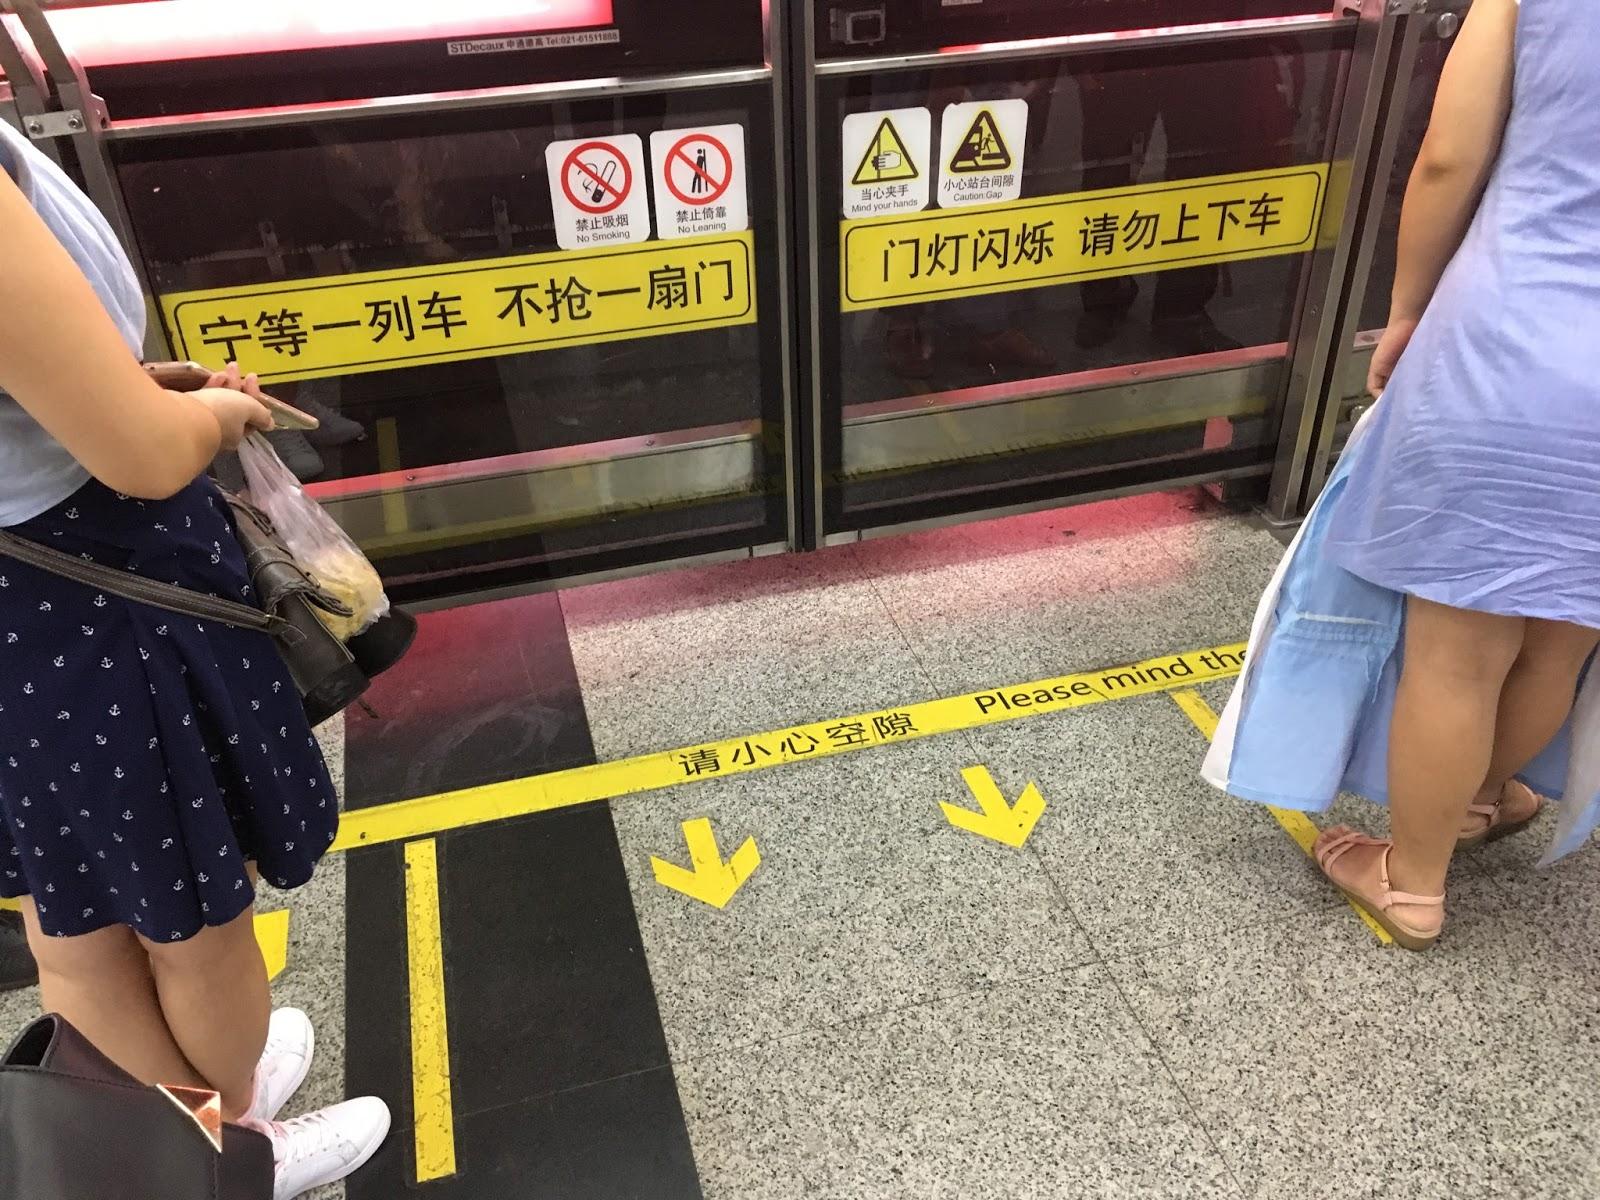 Sanghaj metró